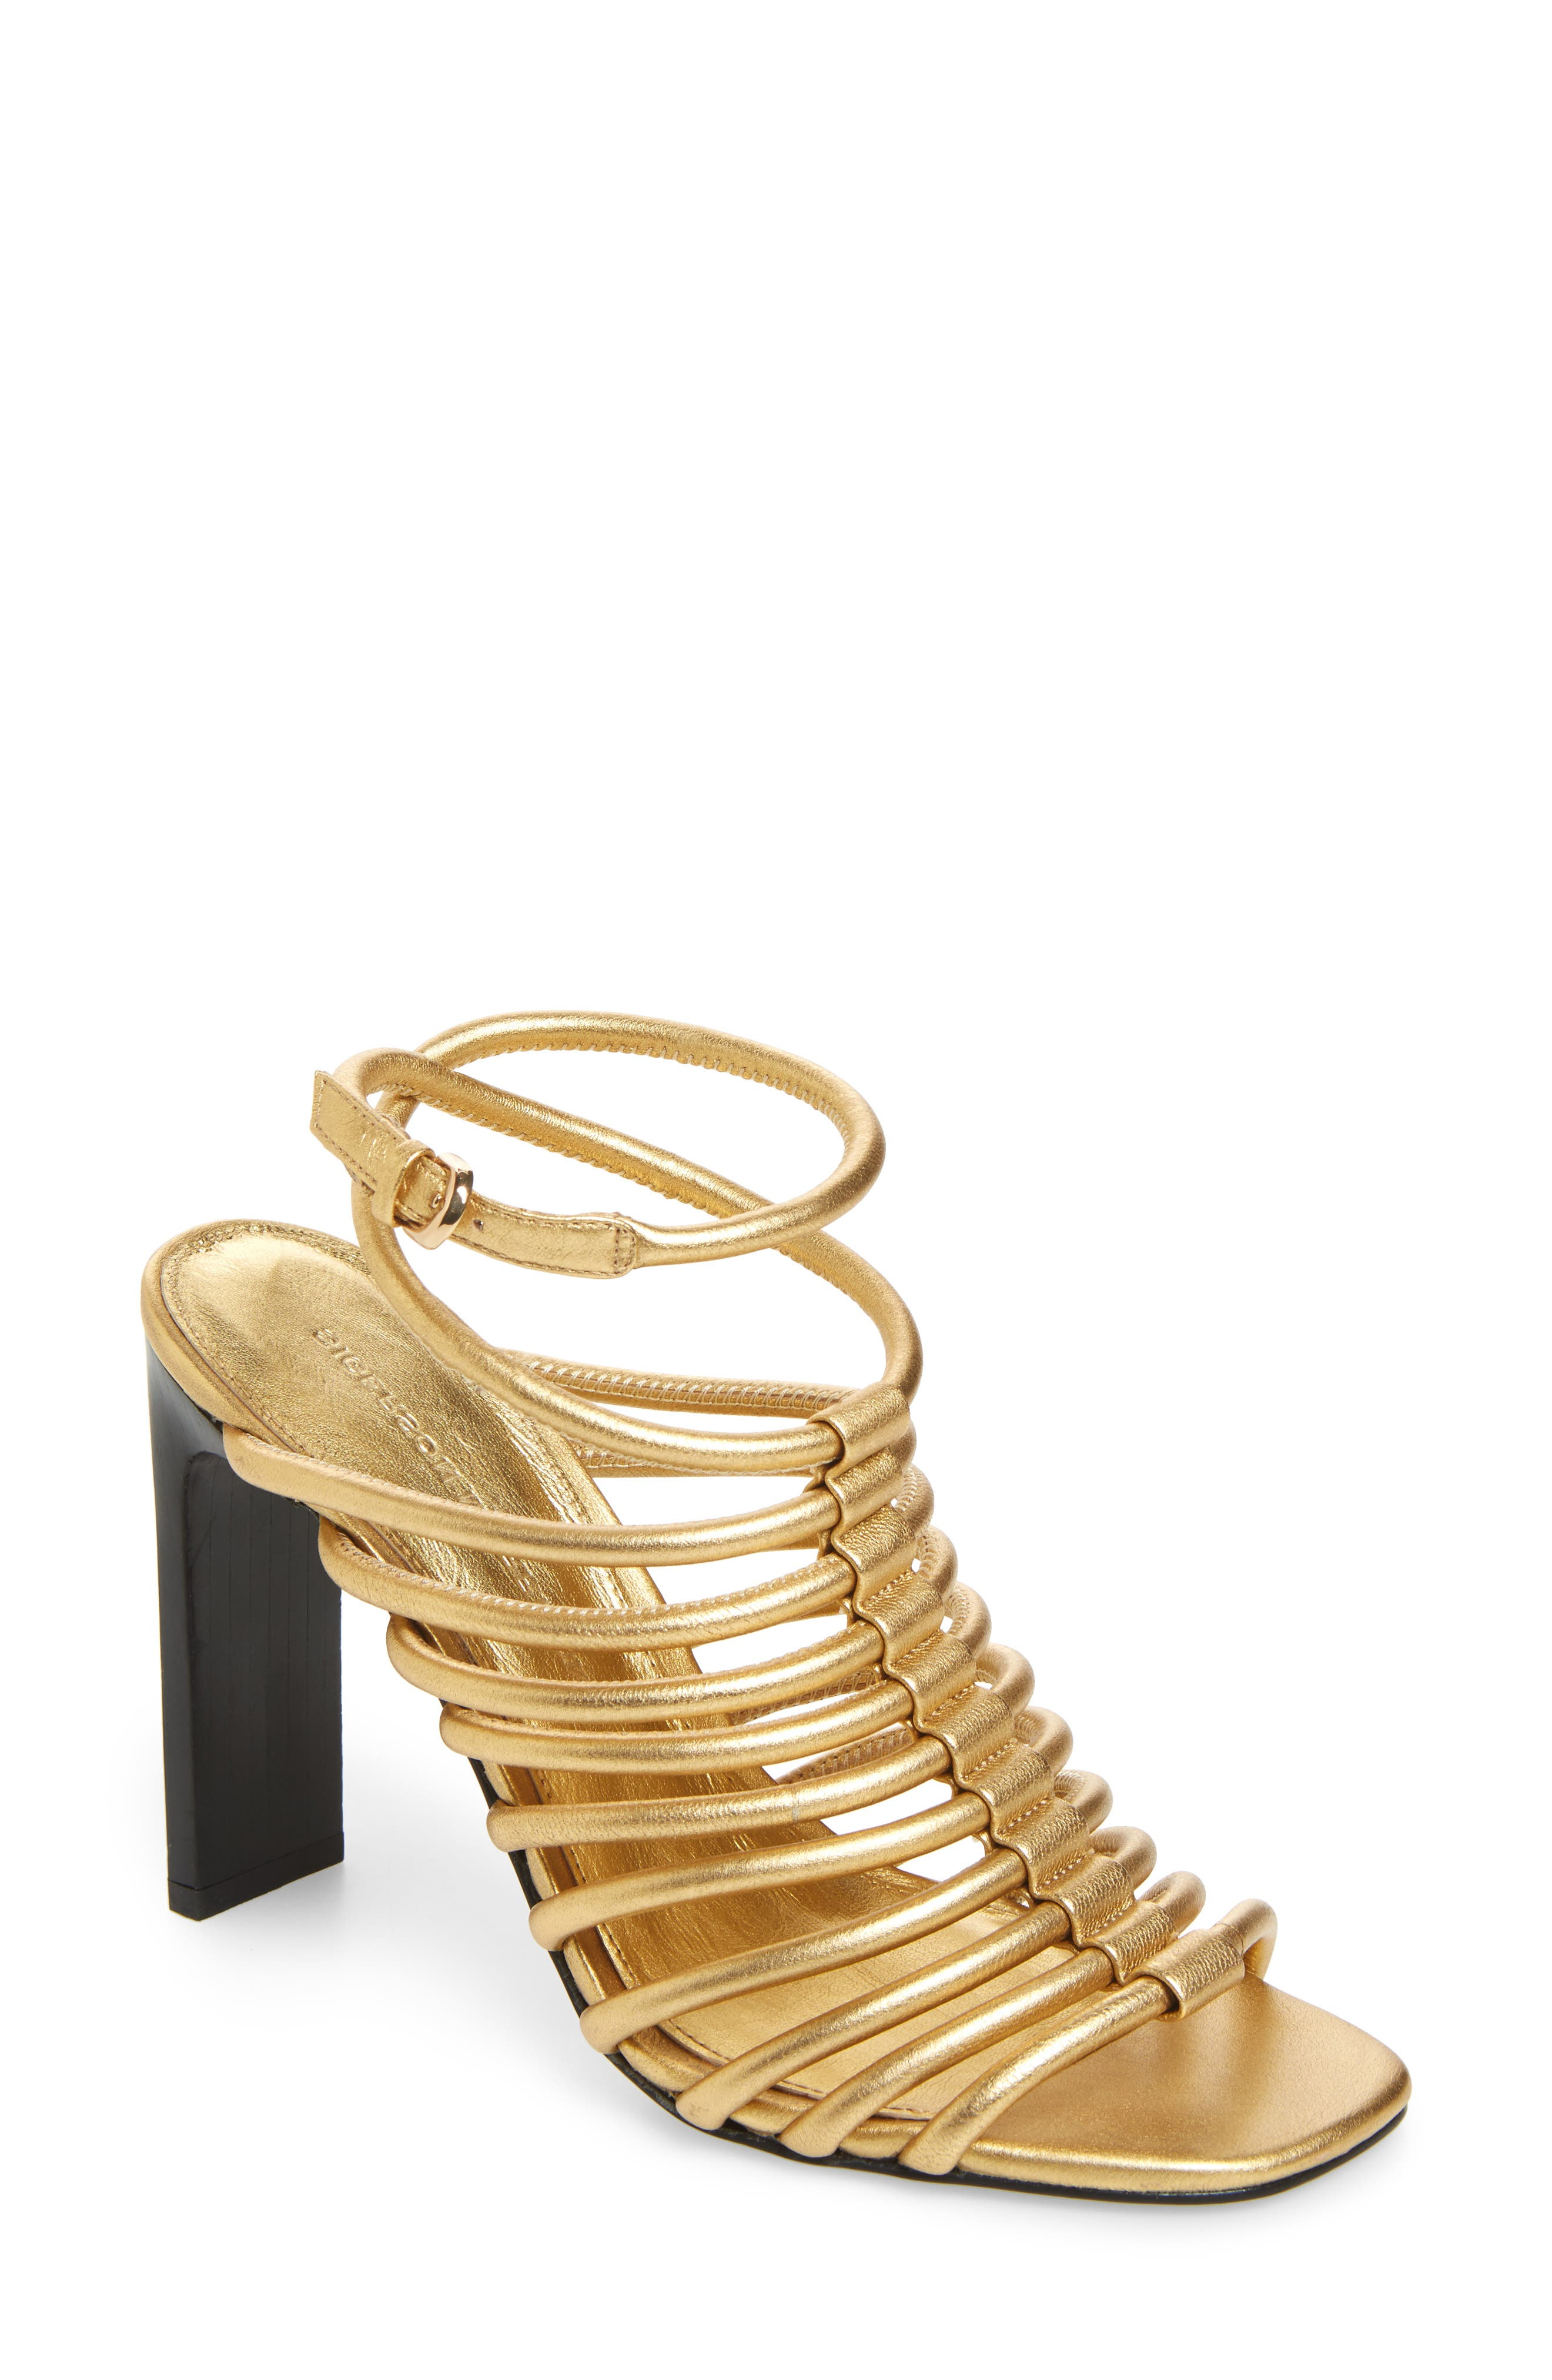 HH Caged Ankle Strap Sandal,                         Main,                         color,